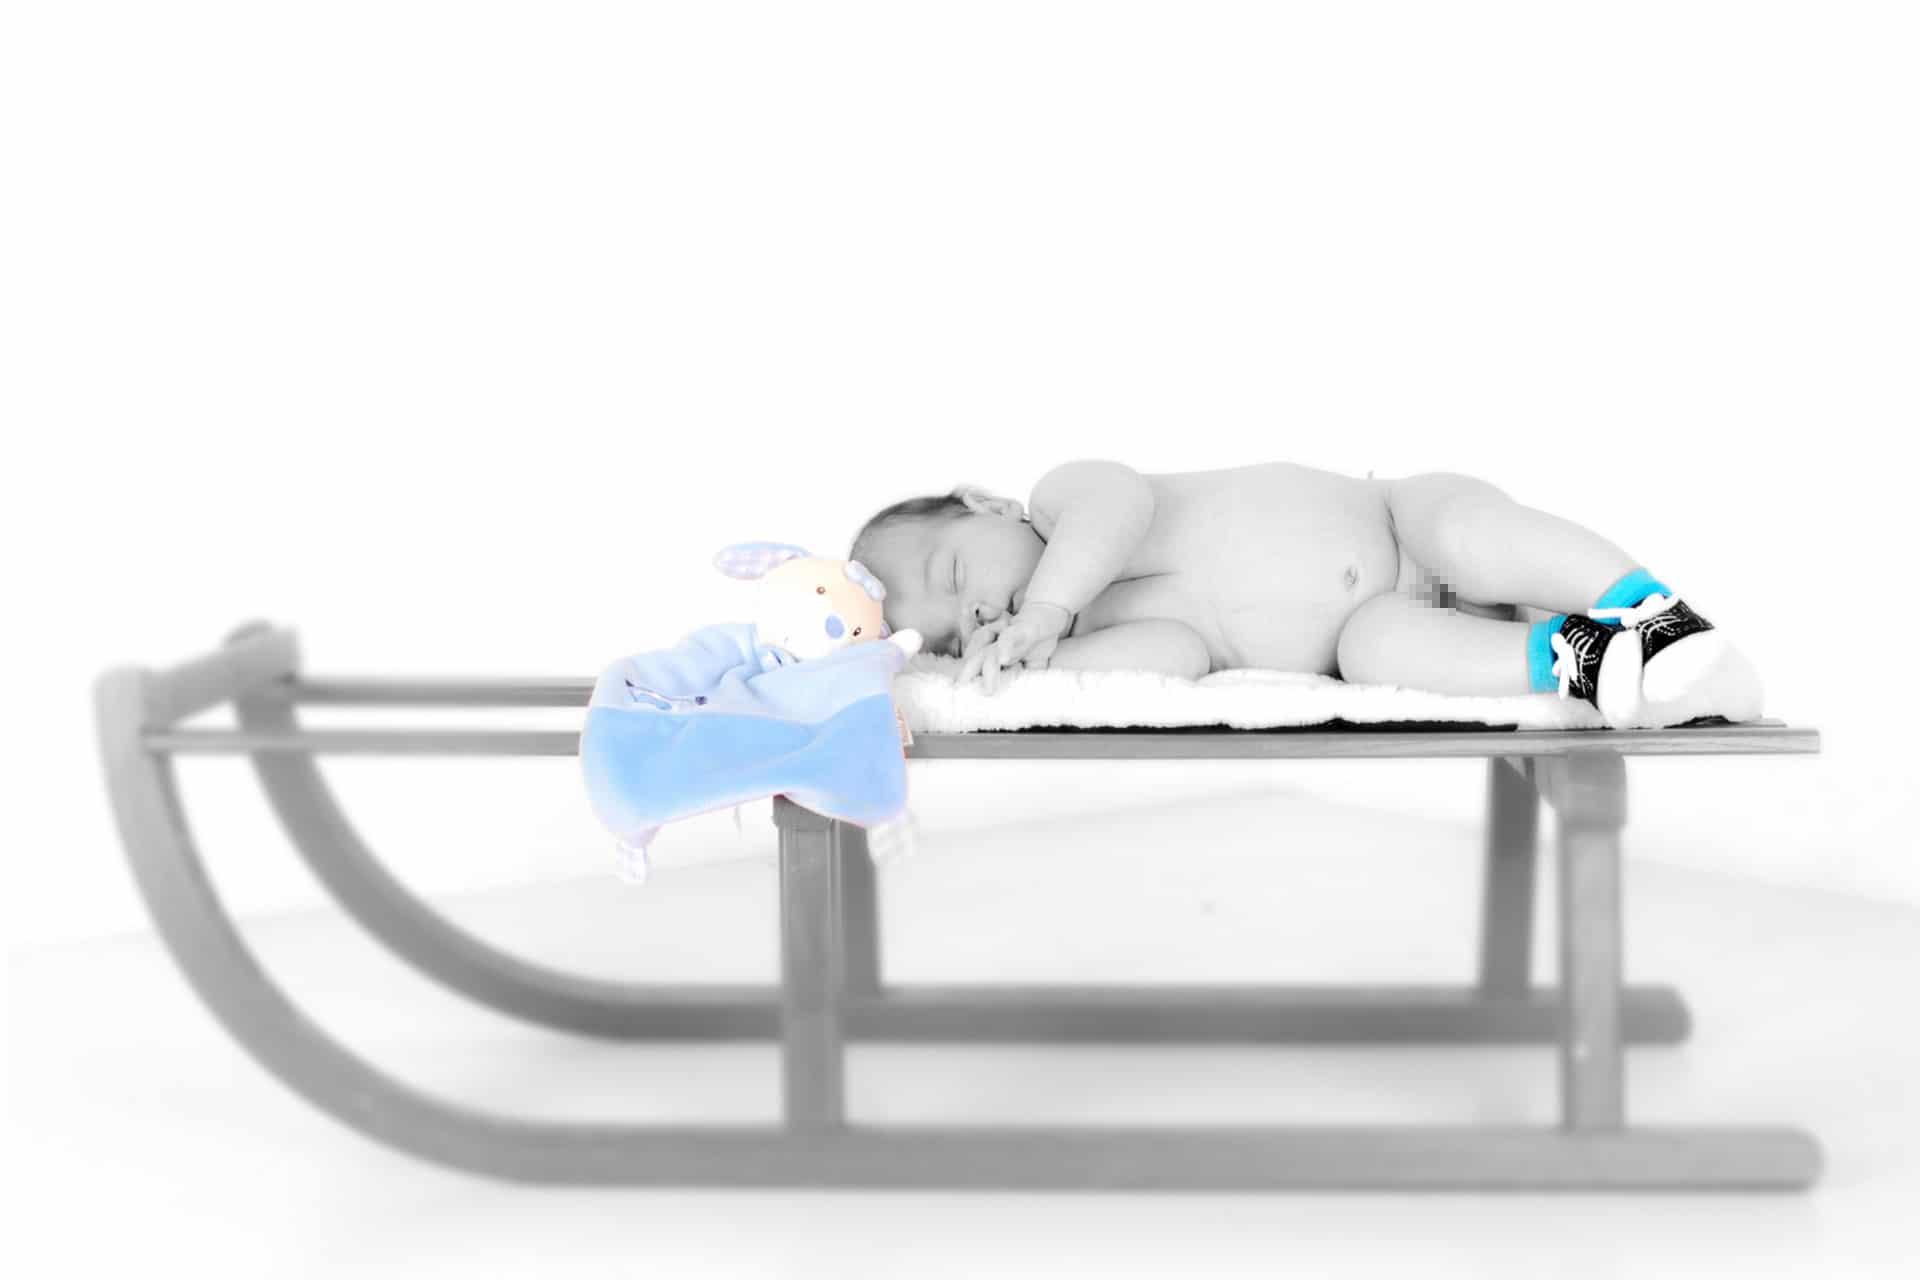 Babyfotos - Babyfotografie – Babyfotograf – Babyshooting Murnau – Foto Stoess